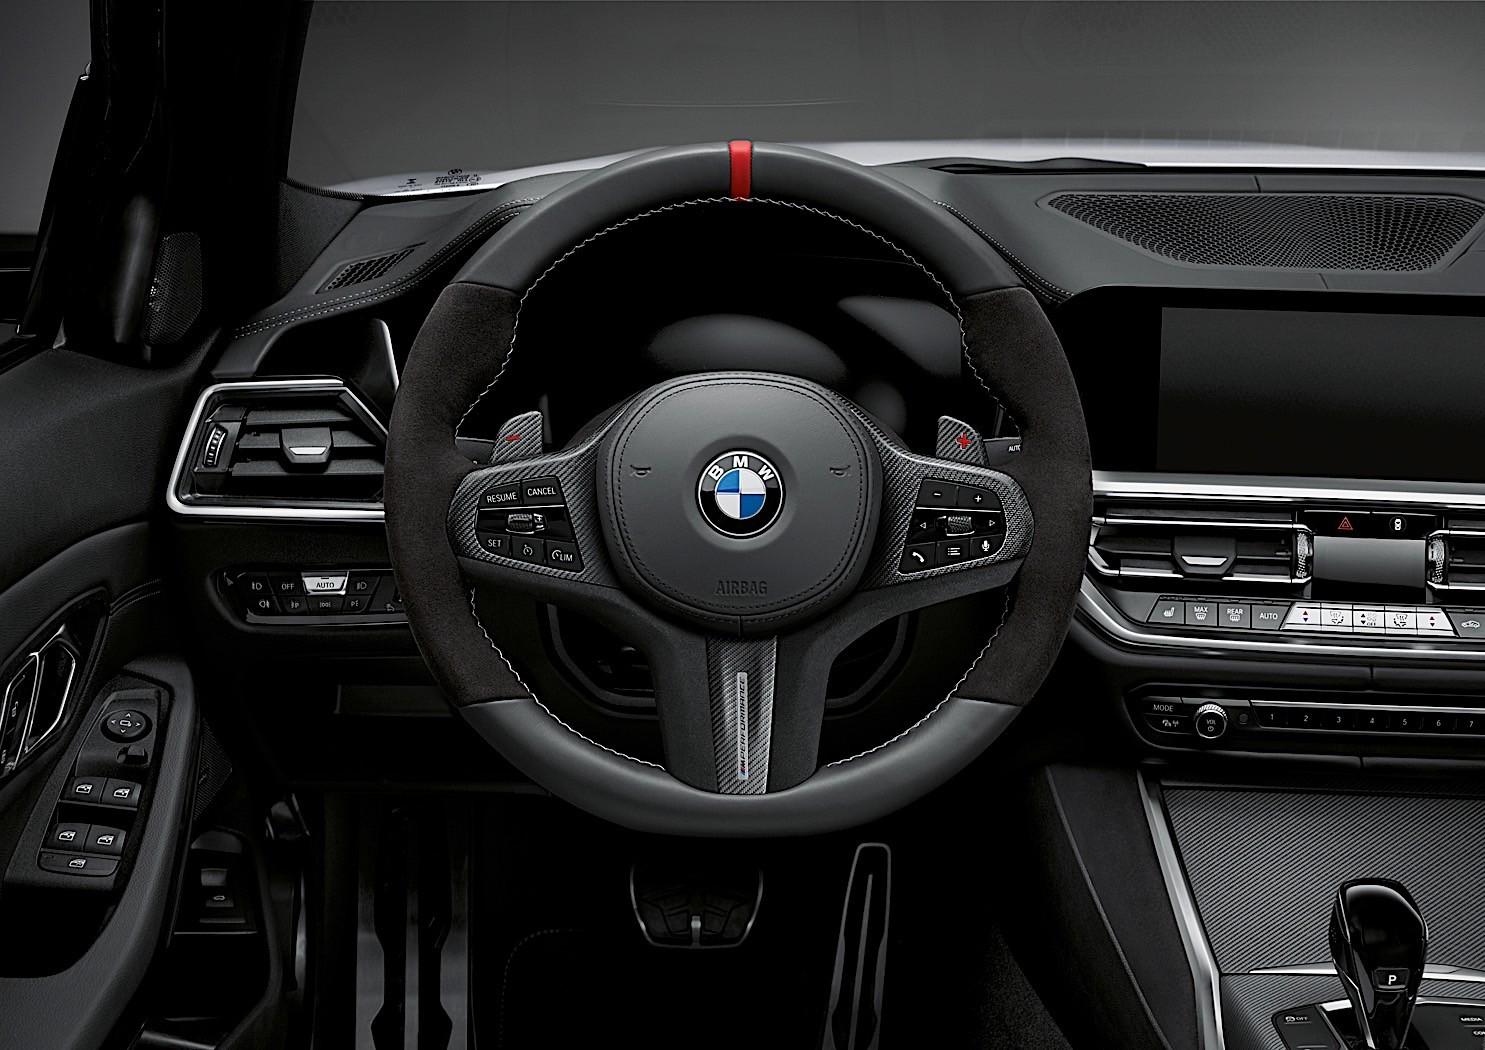 2020 BMW 3 Series M Performance Parts Take the Sedan to an ...